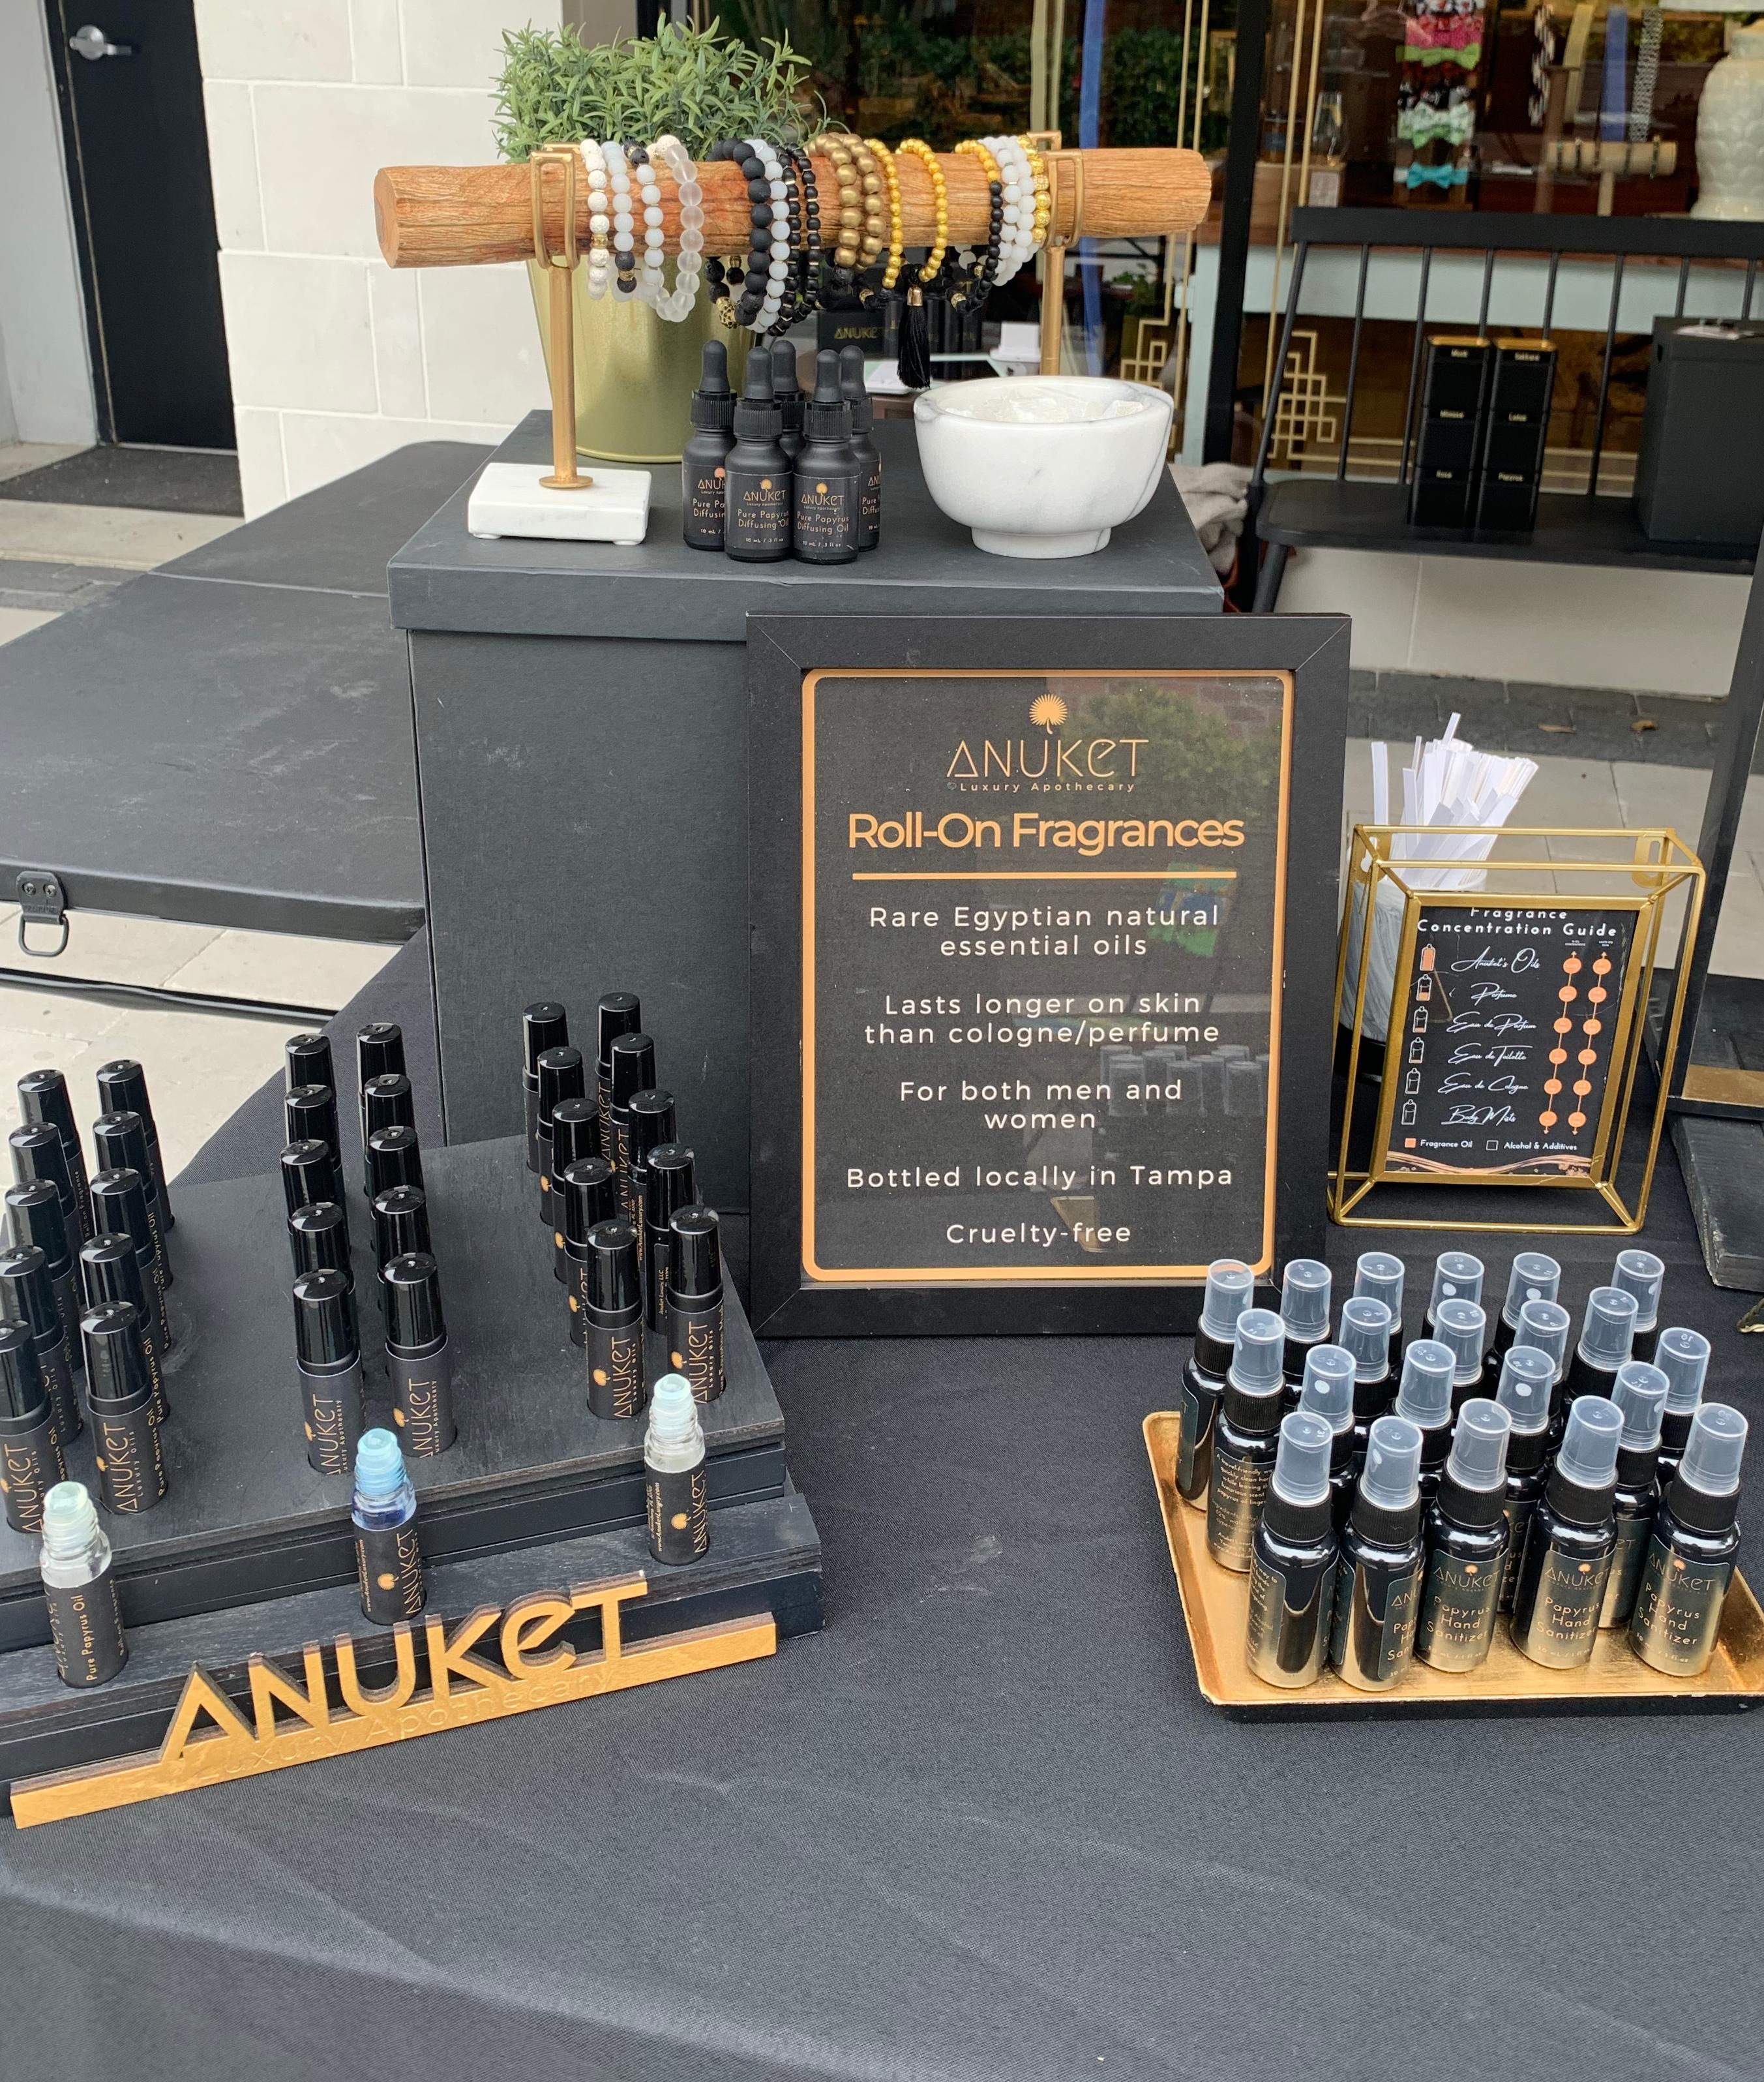 Link to Shop Anuket Luxury Apothecary Papyrus Hand Sanitizer